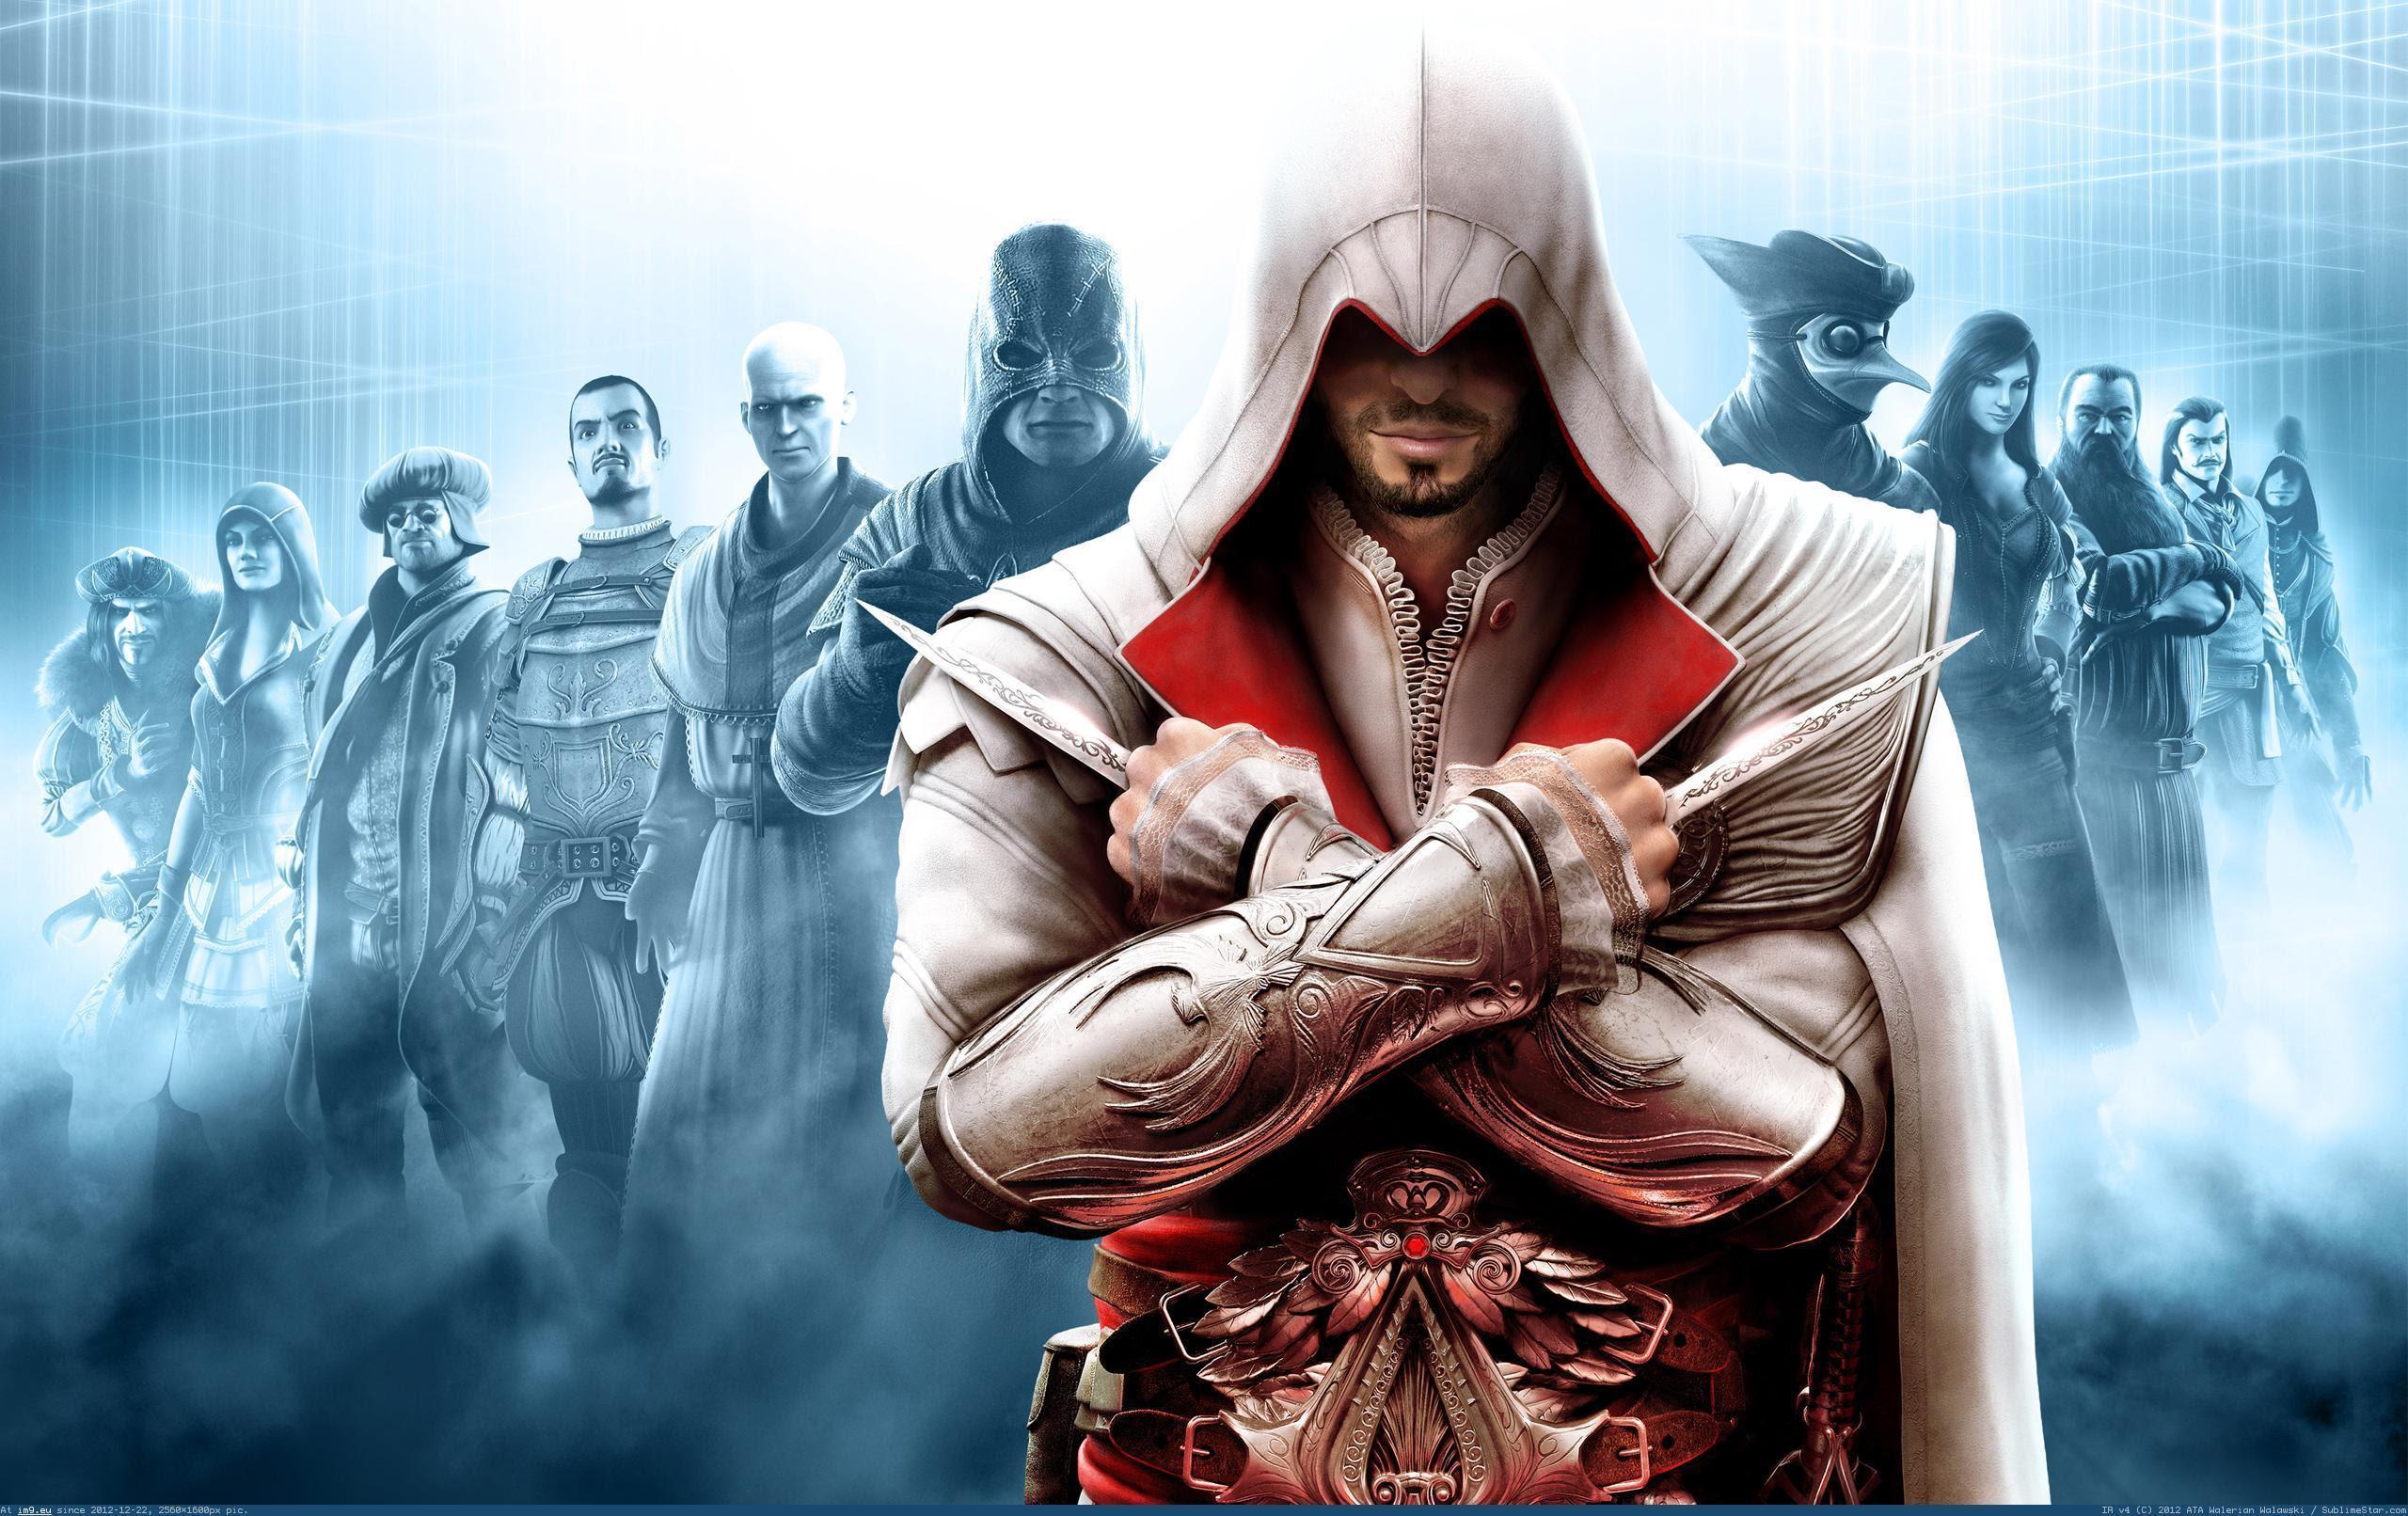 Game Wallpaper Assassin U002639 S Creed 3 Wallpapers Hd Wallpaper